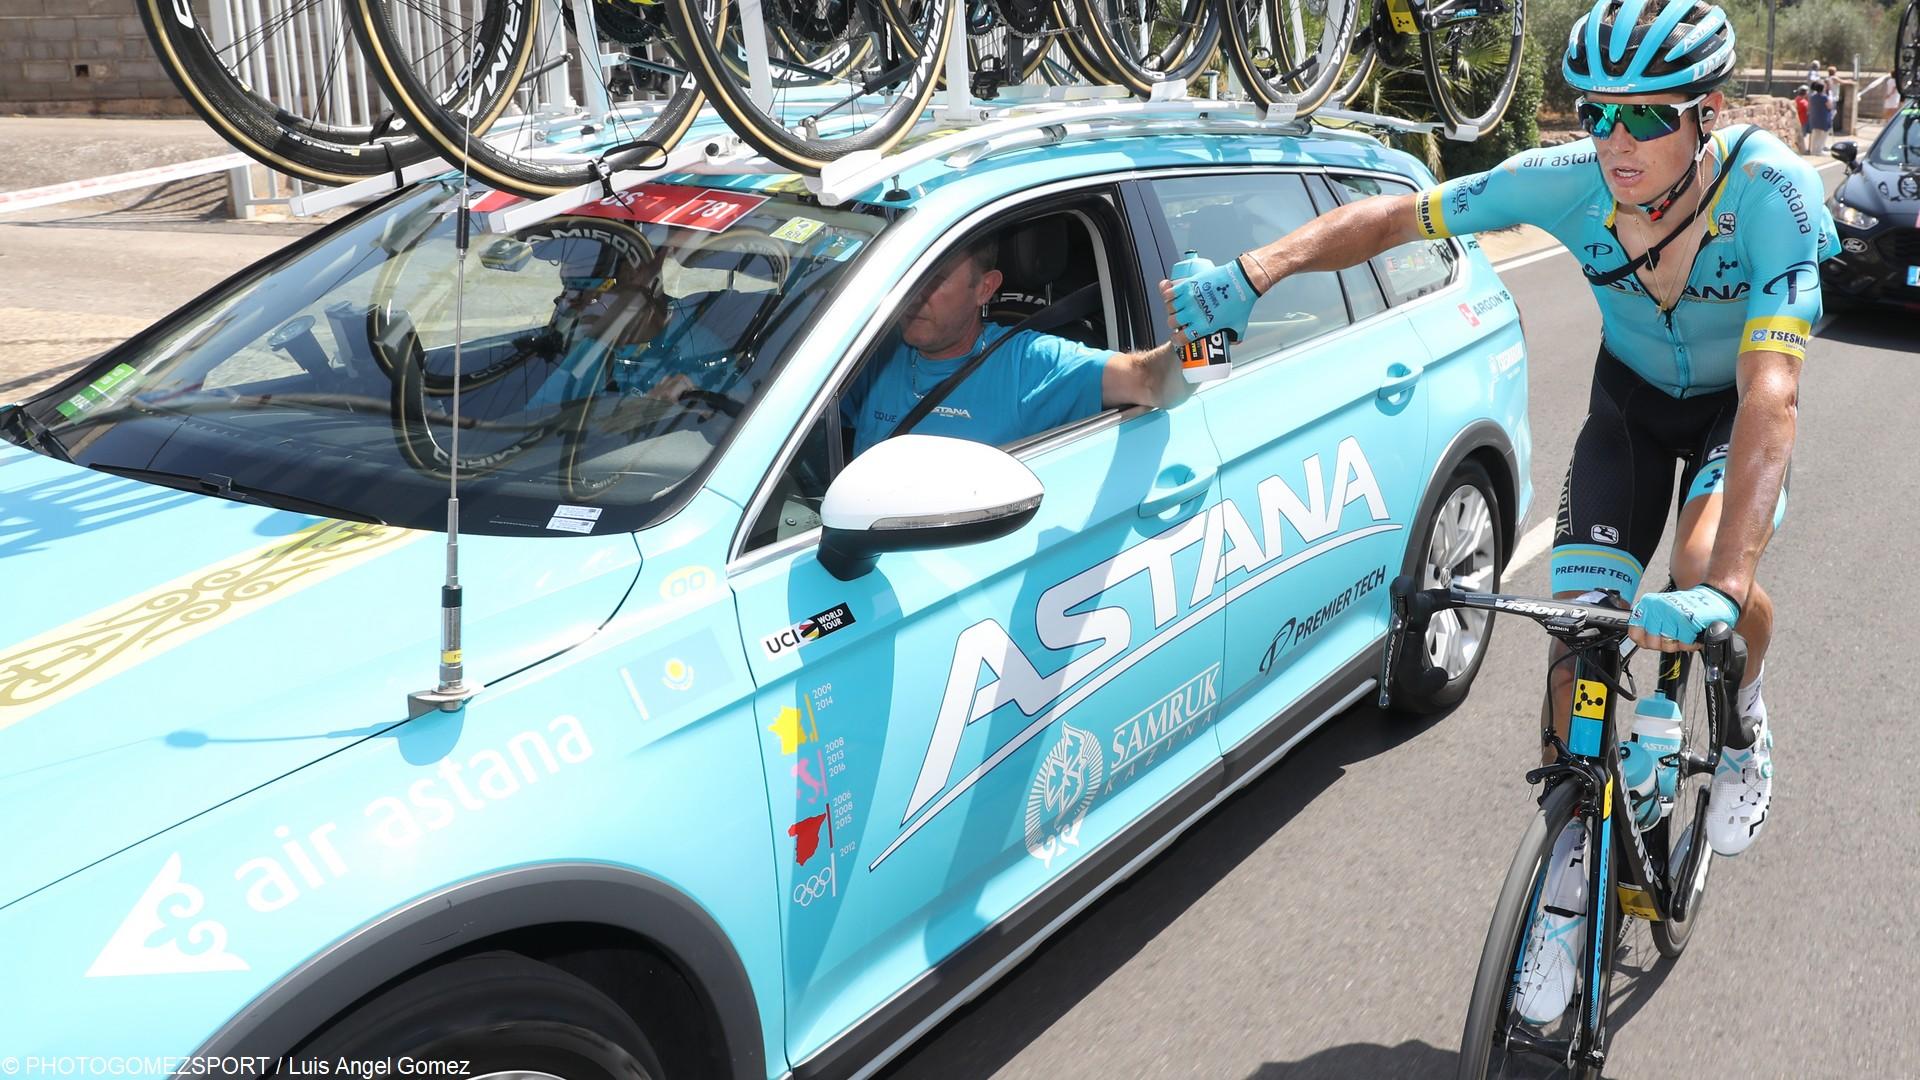 Equipe Astana (c) PHOTOGOMEZSPORT Luis Angel Gomez